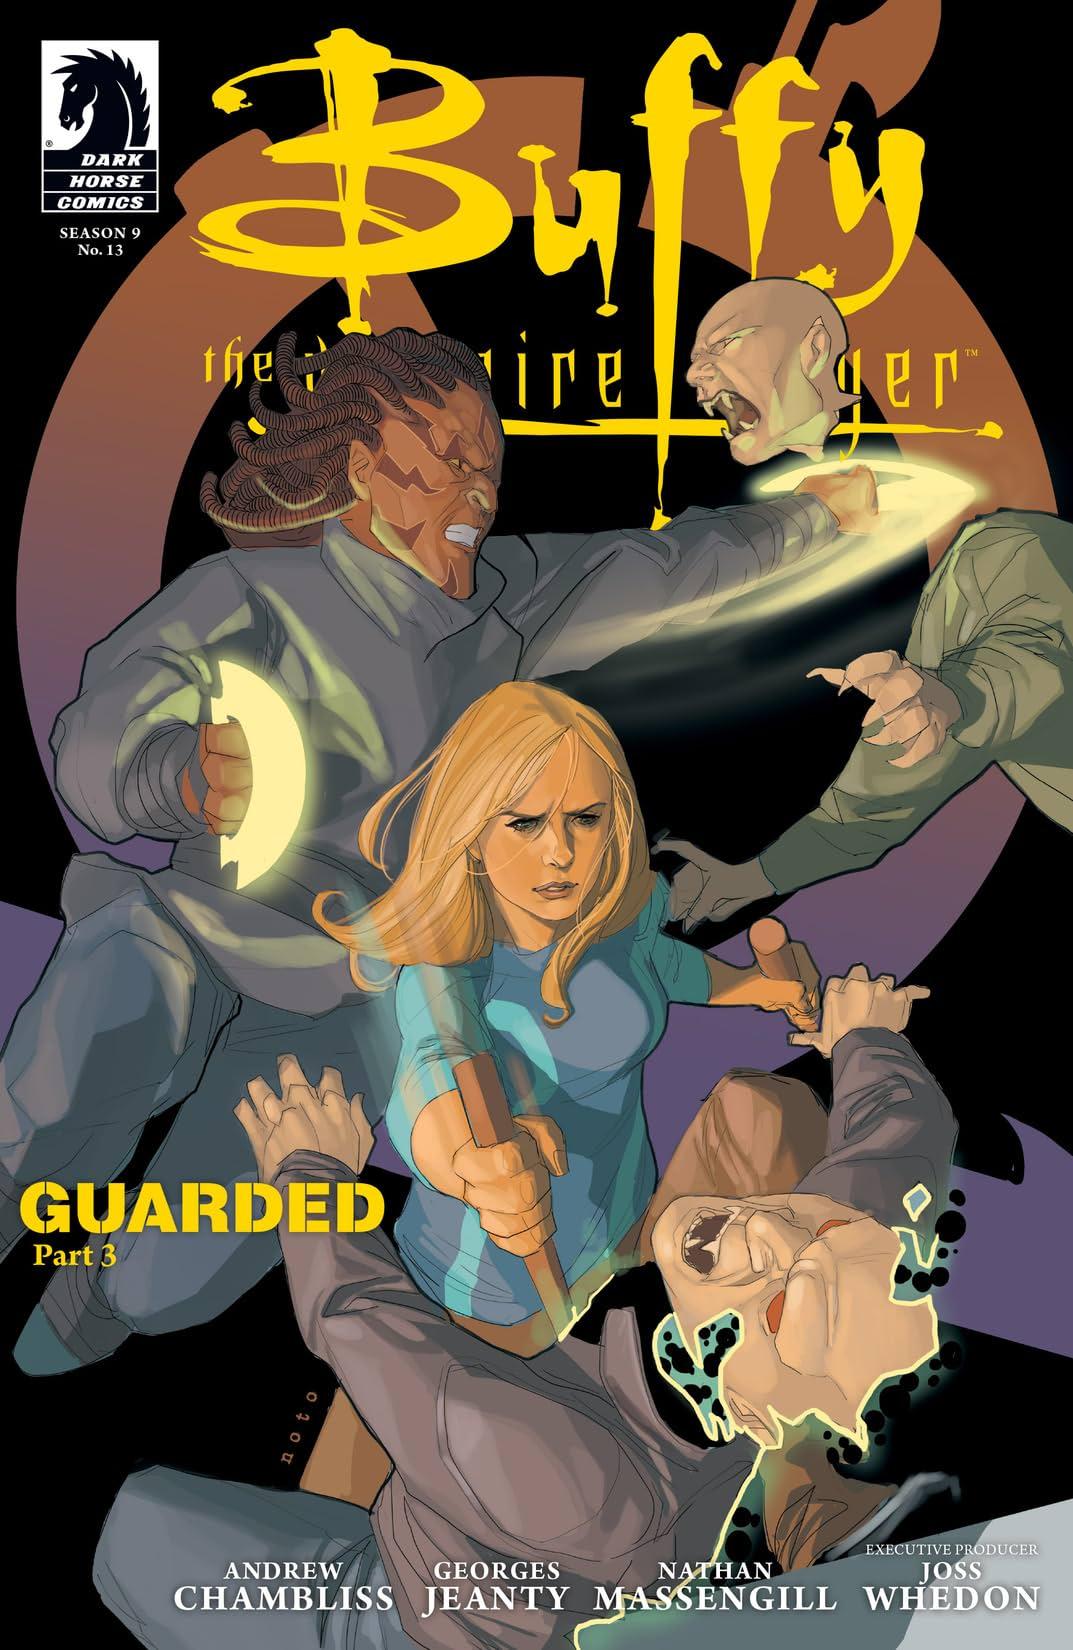 Buffy the Vampire Slayer: Season 9 #13